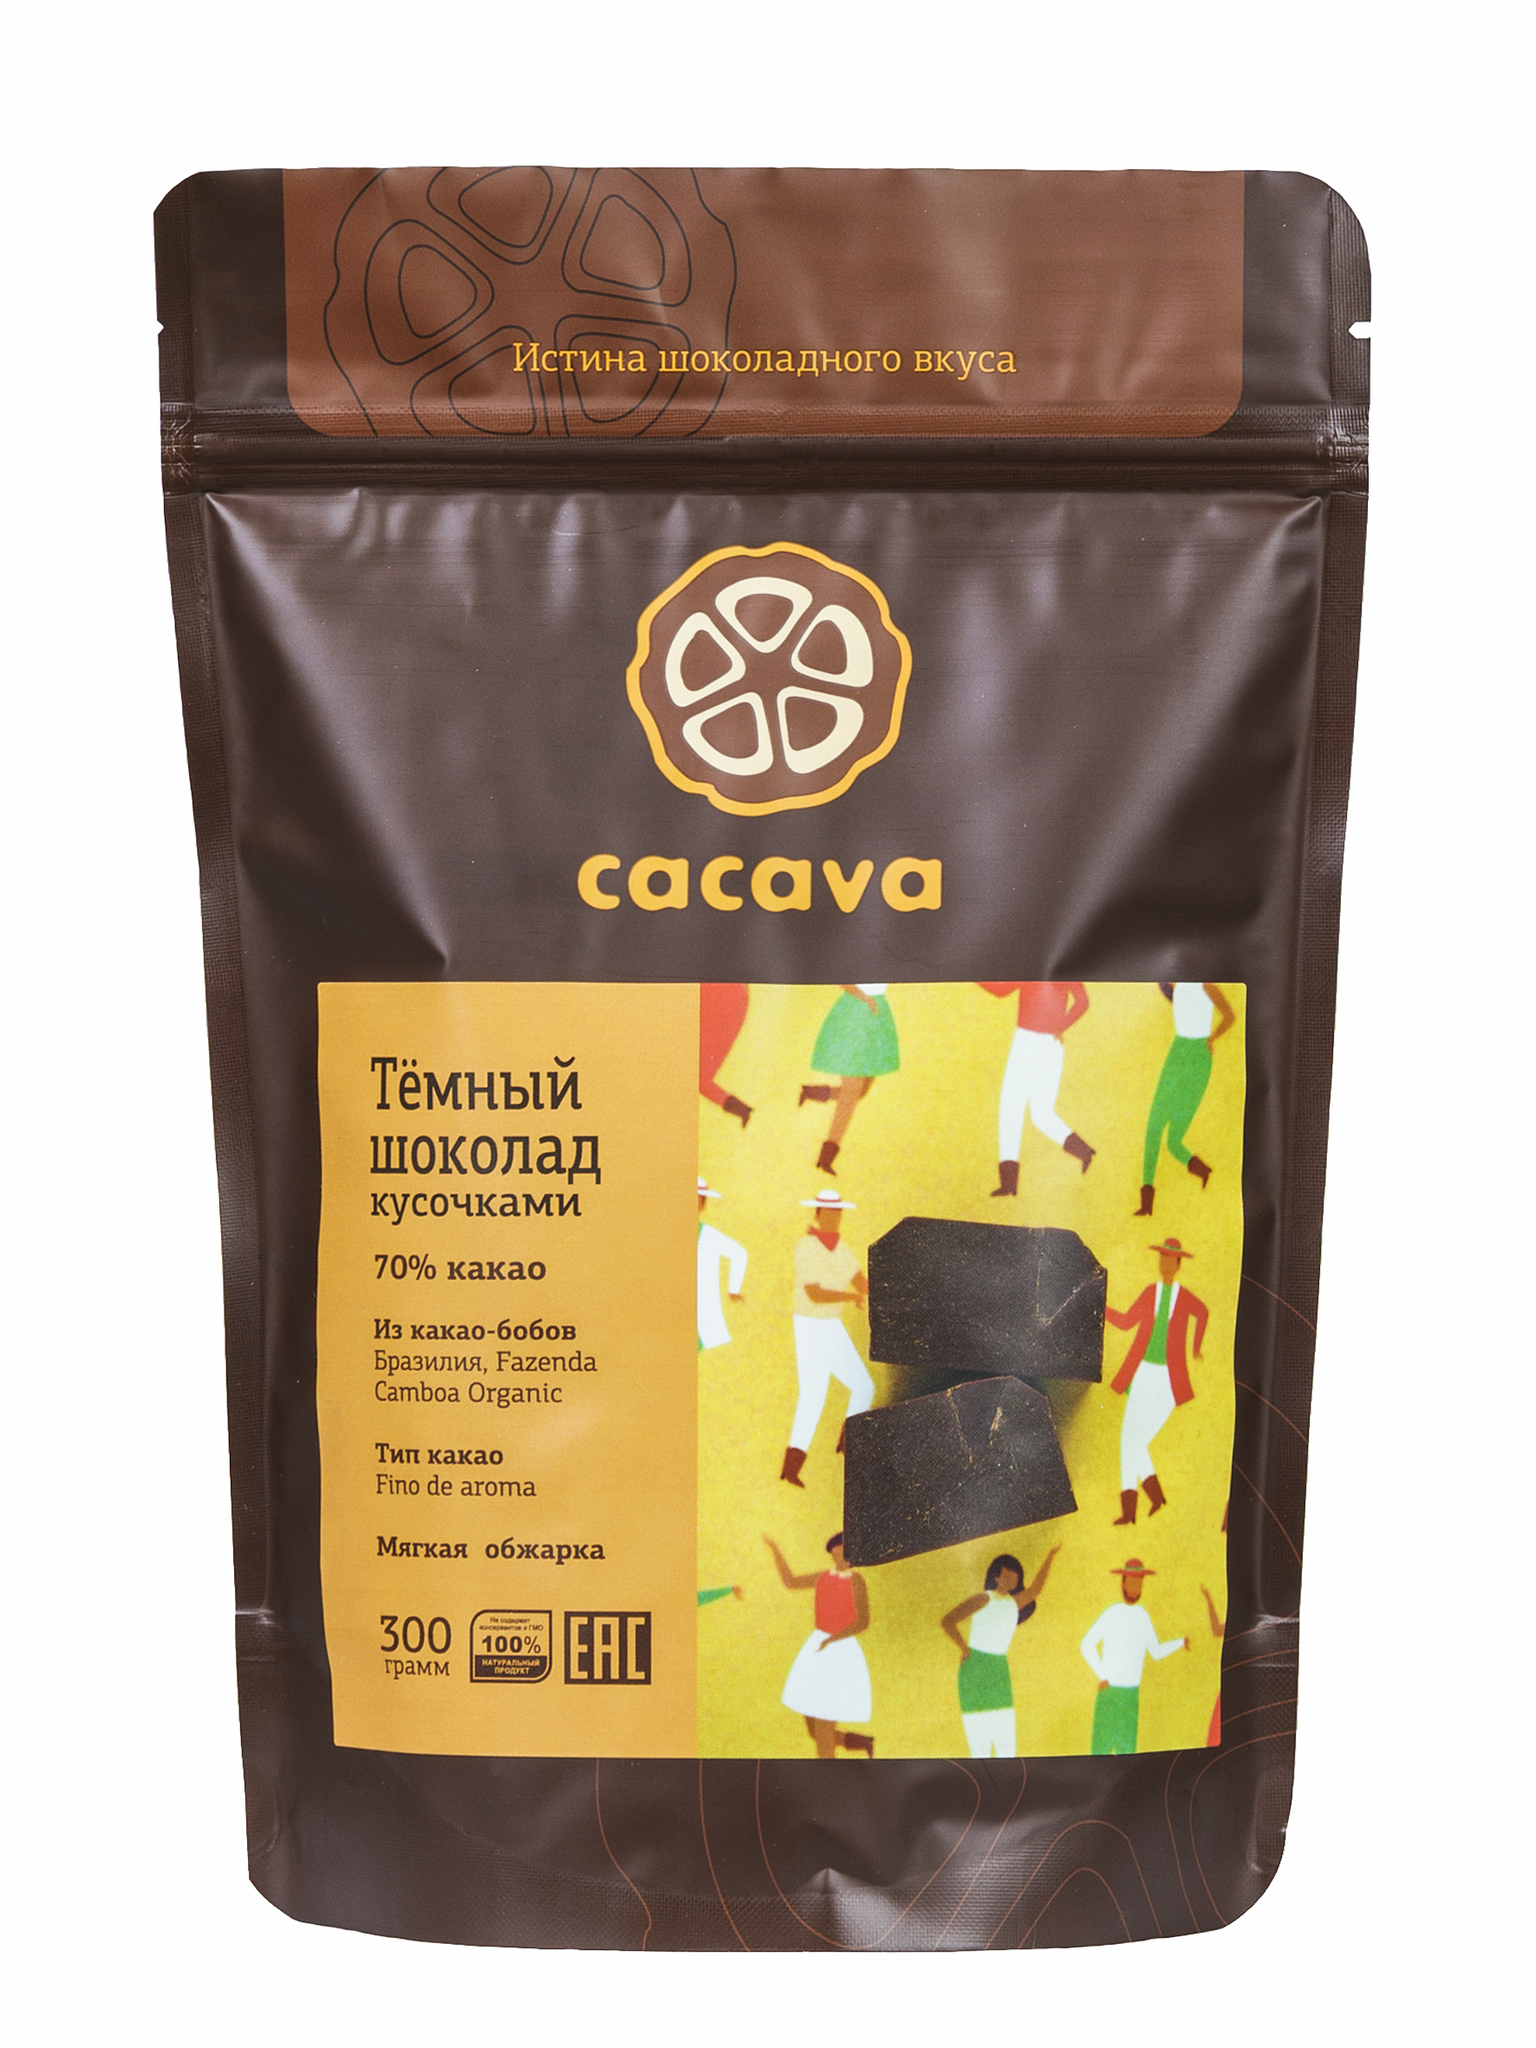 Тёмный шоколад 70 % какао (Бразилия, Fazenda Camboa), упаковка 300 грамм